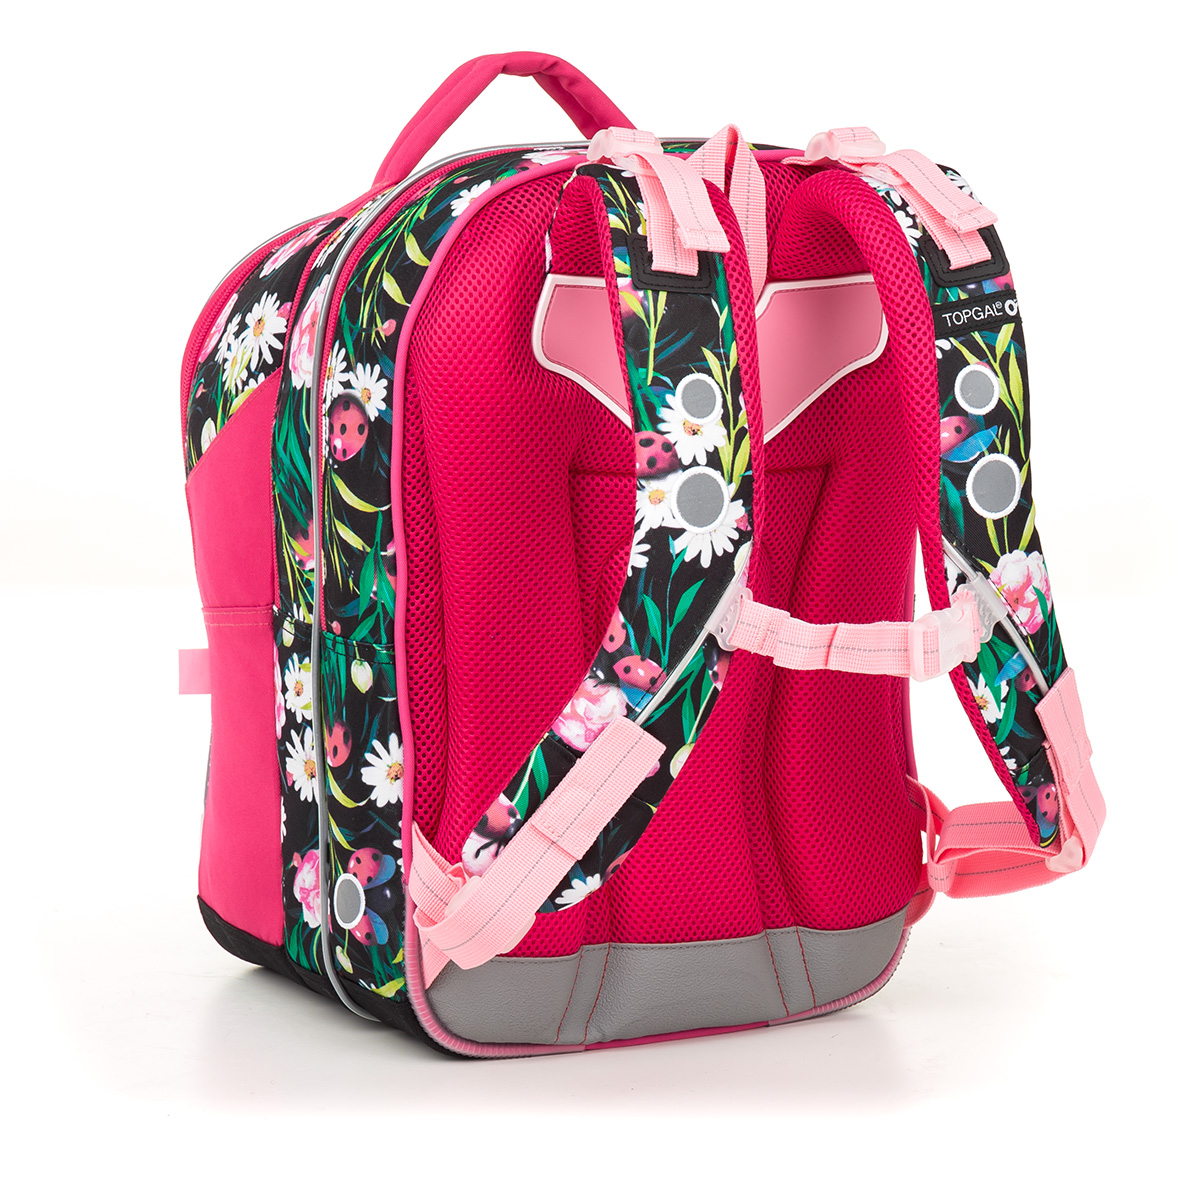 Školní batoh Topgal COCO 18004 G